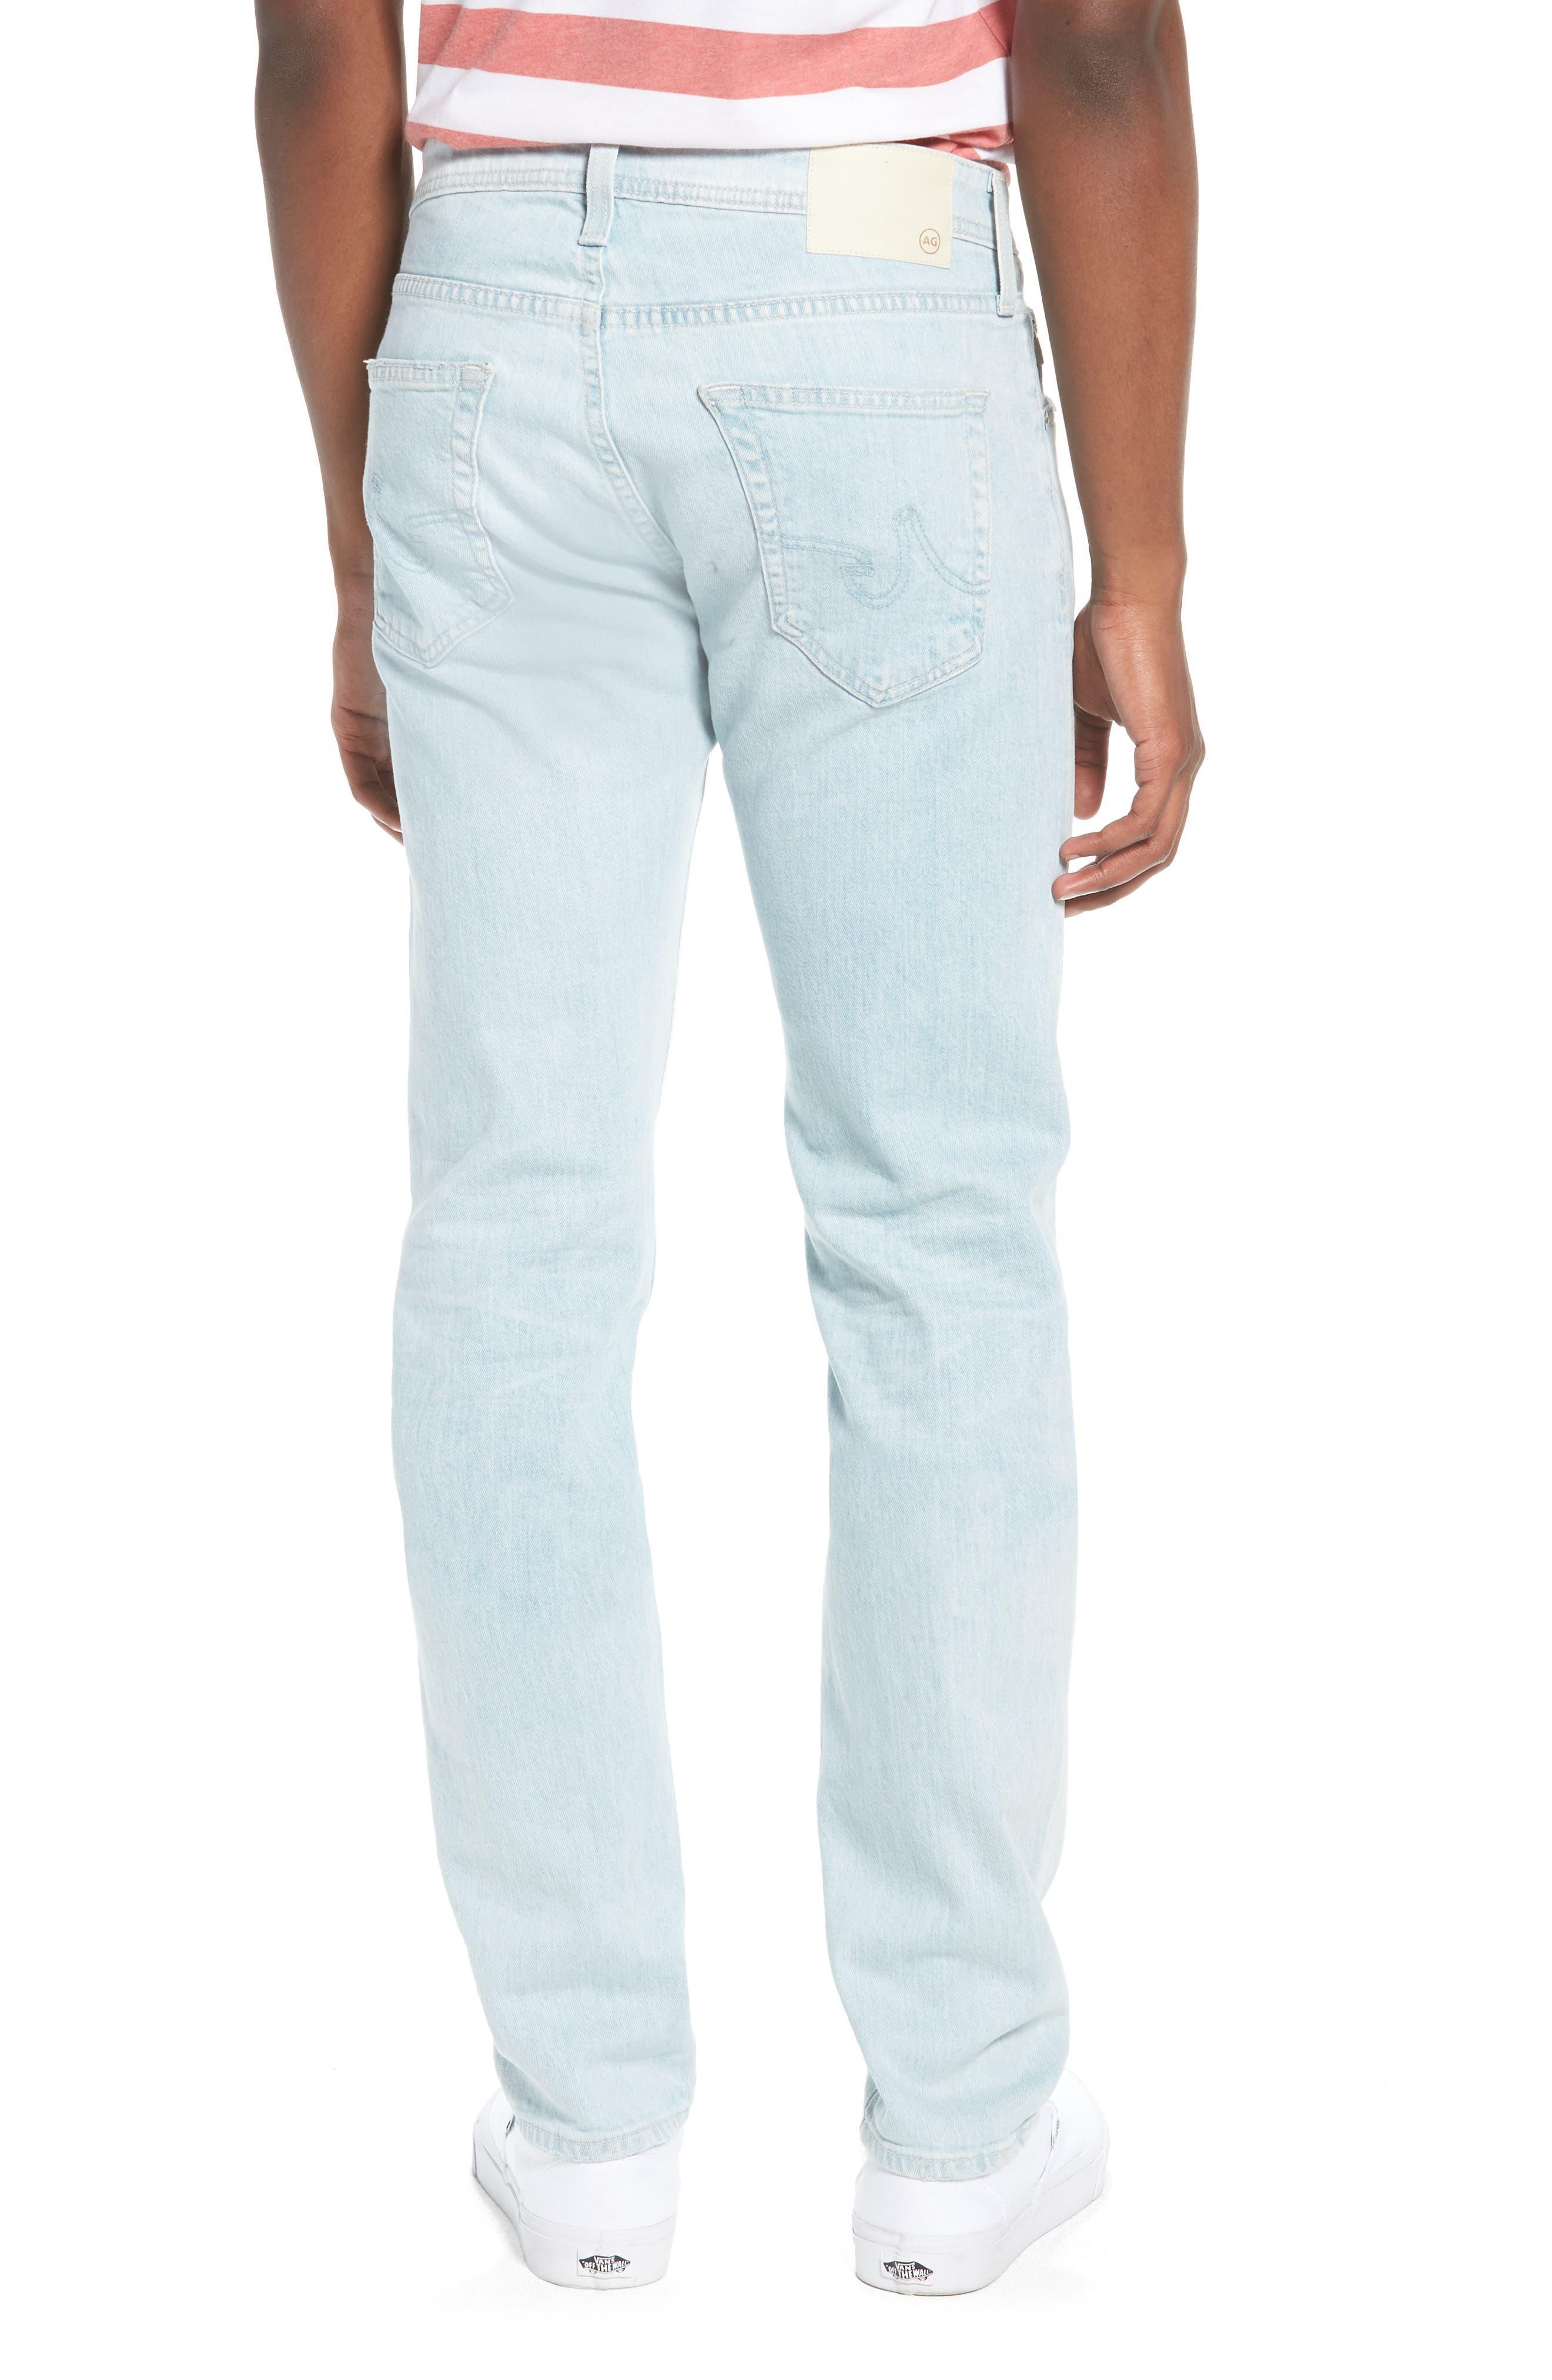 Dylan Skinny Fit Jeans,                             Alternate thumbnail 2, color,                             28 Years Salt Mist